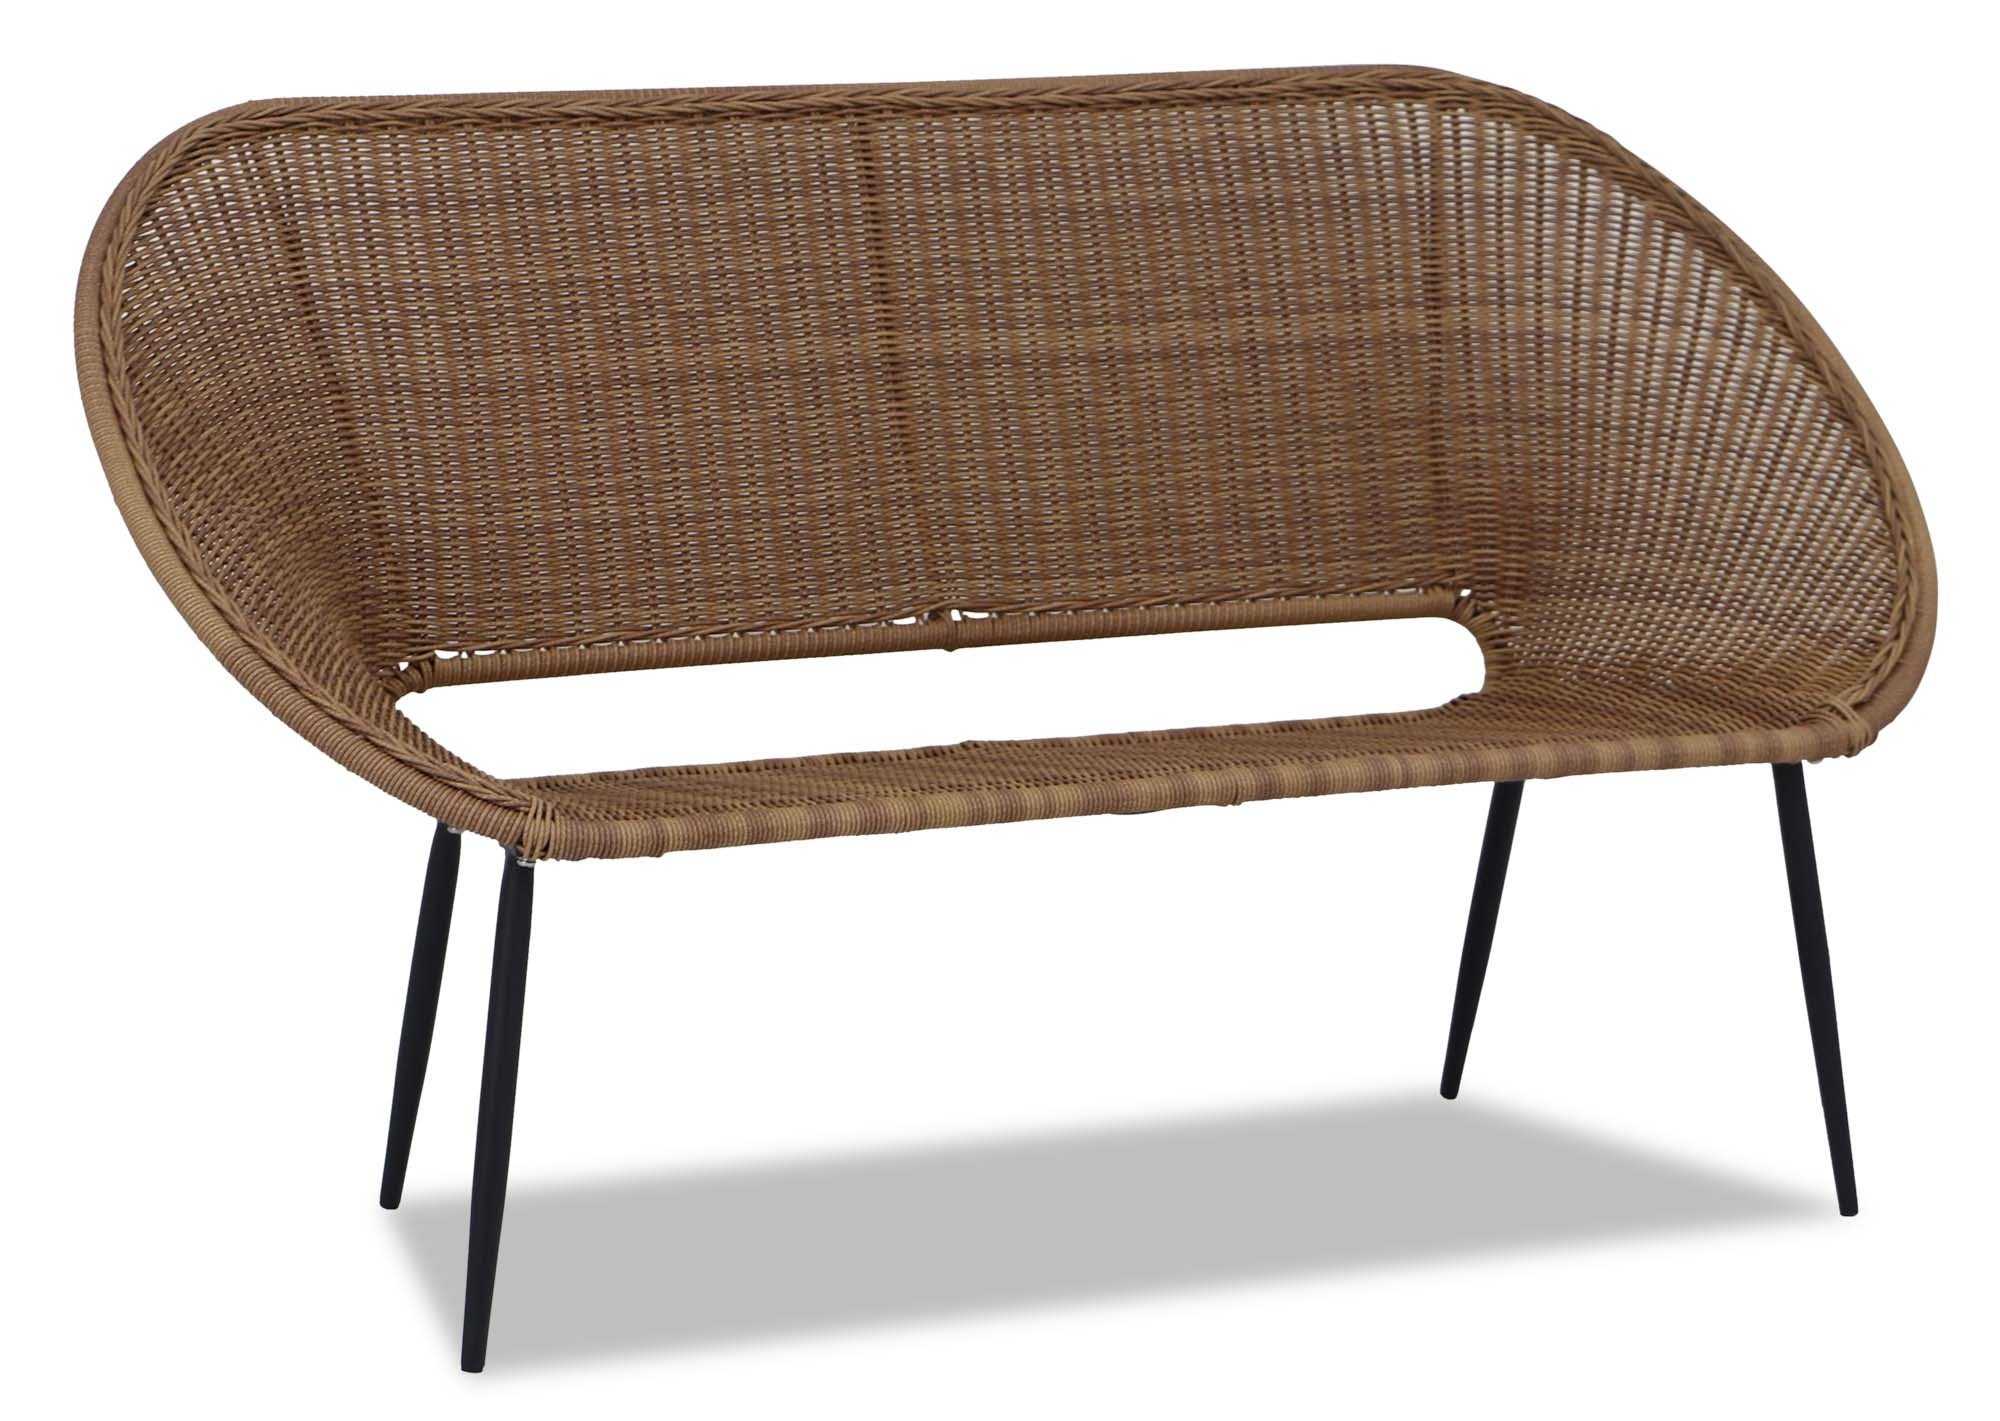 Alikhan Wicker Patio Sofa Sofas Sofa Beds Recliners